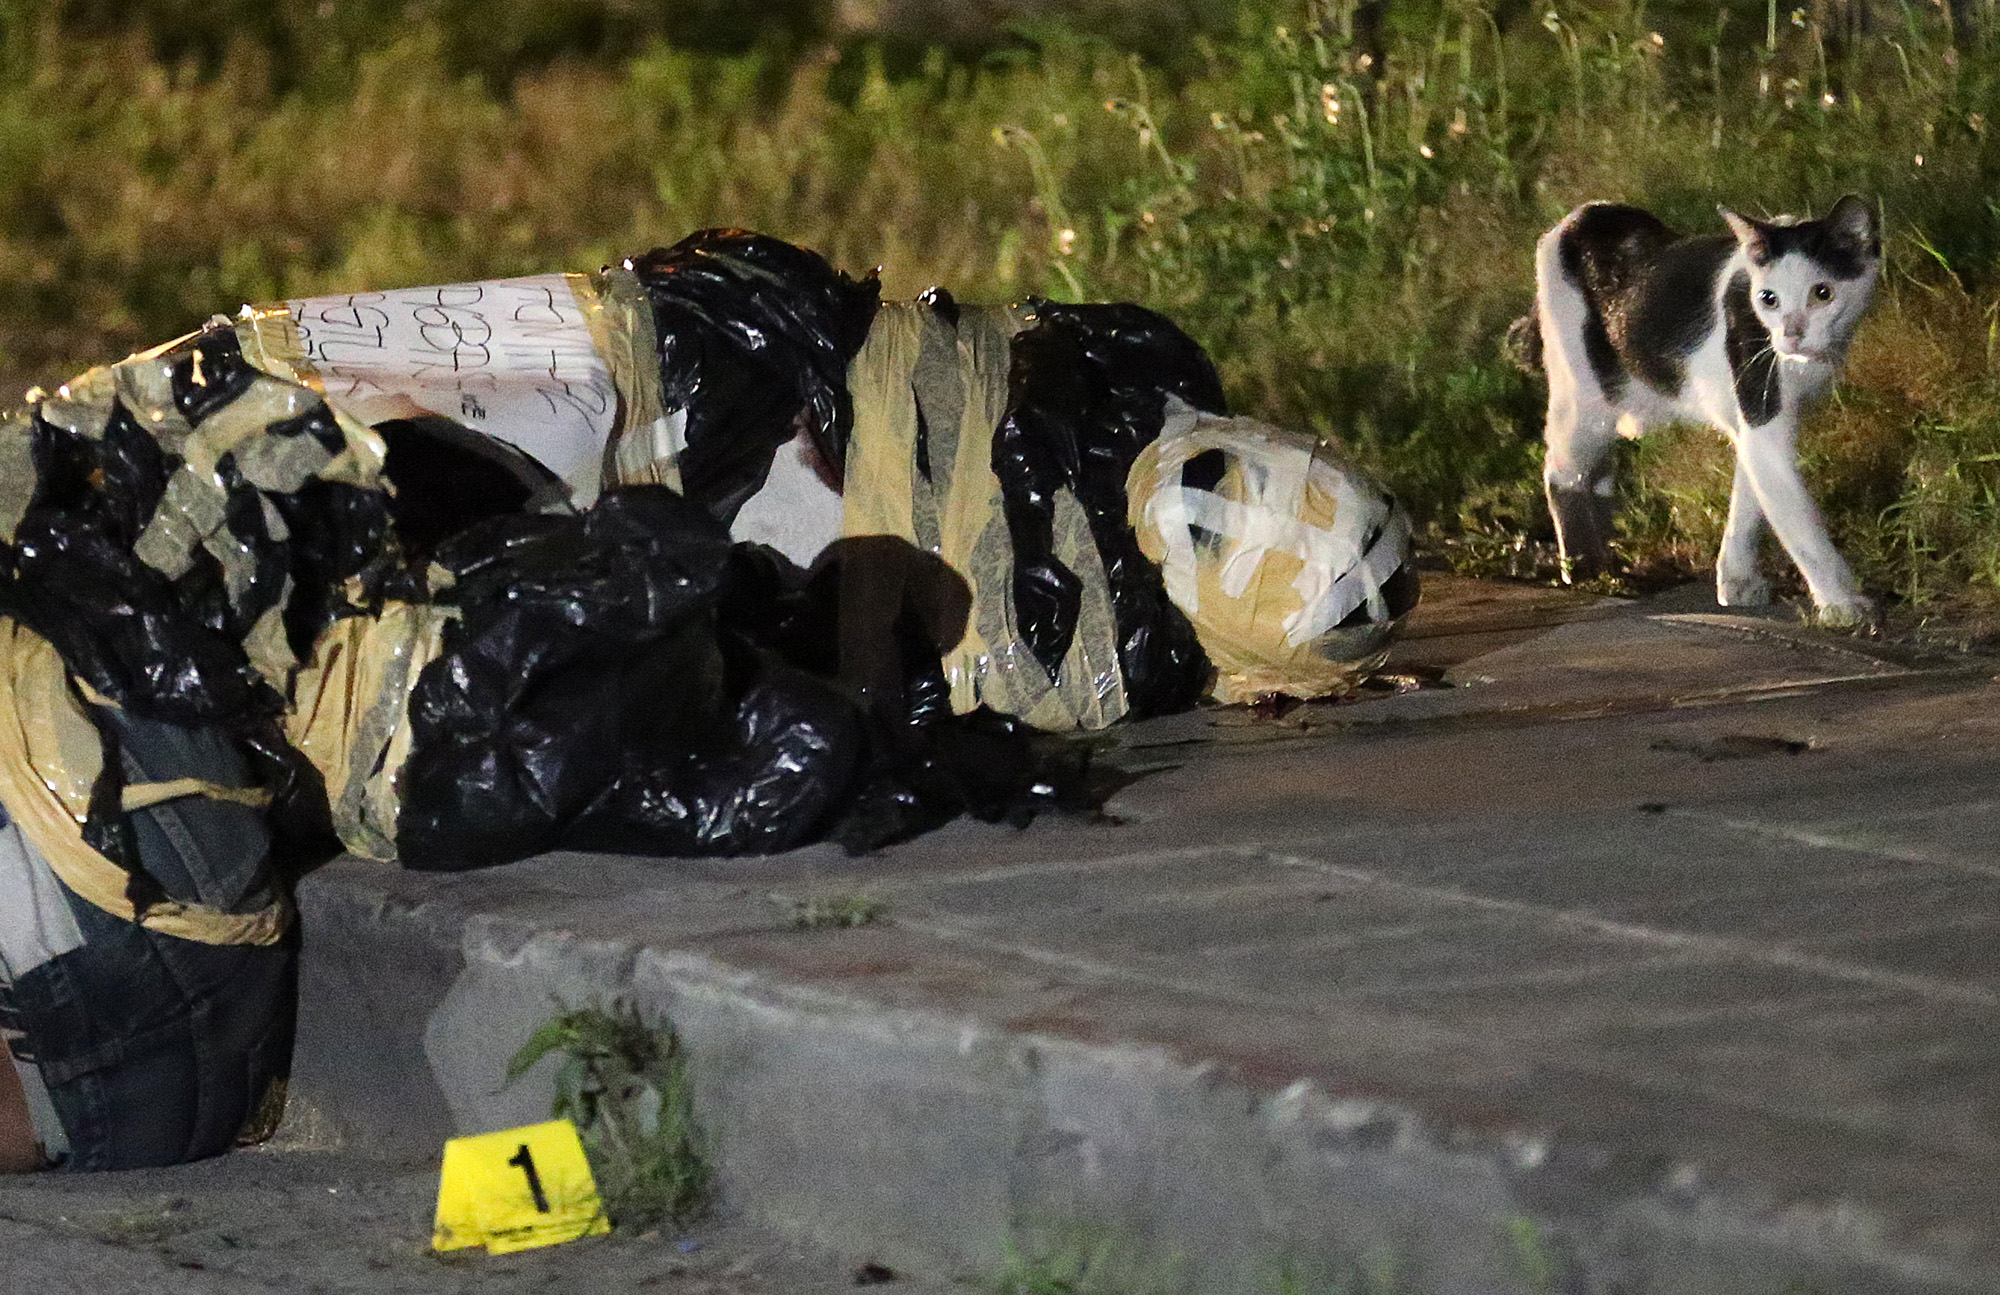 "A cat looks at the dead bodies wrapped in garbage bags found at Estacion St, Barangay Pio del Pilar, Makati City on December 1, 2016. Placards which wrote, ""Nagmahal, Nasaktan, Nagtulak, #Namatay"" and ""Nagmahal, Nasaktan, Nag-basag kotse, #Namatay"" were left beside unidentified victims."